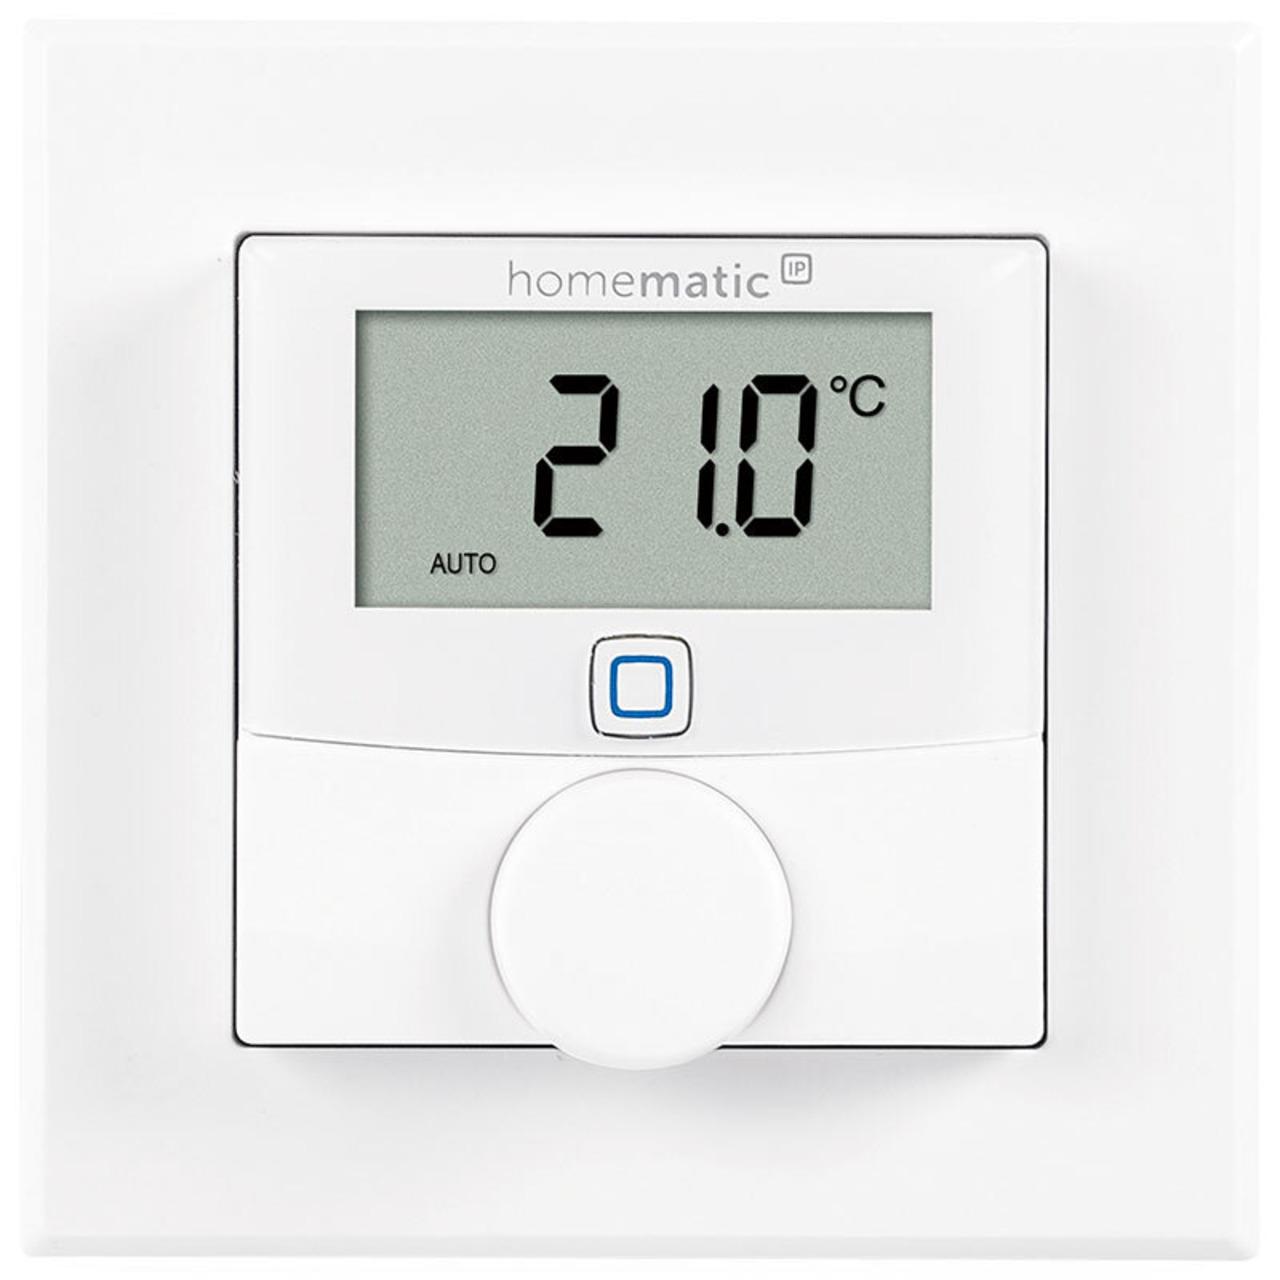 ELV Homematic IP Komplettbausatz Wandthermostat HmIP-WTH-2- fund-252 r Smart Home - Hausautomation